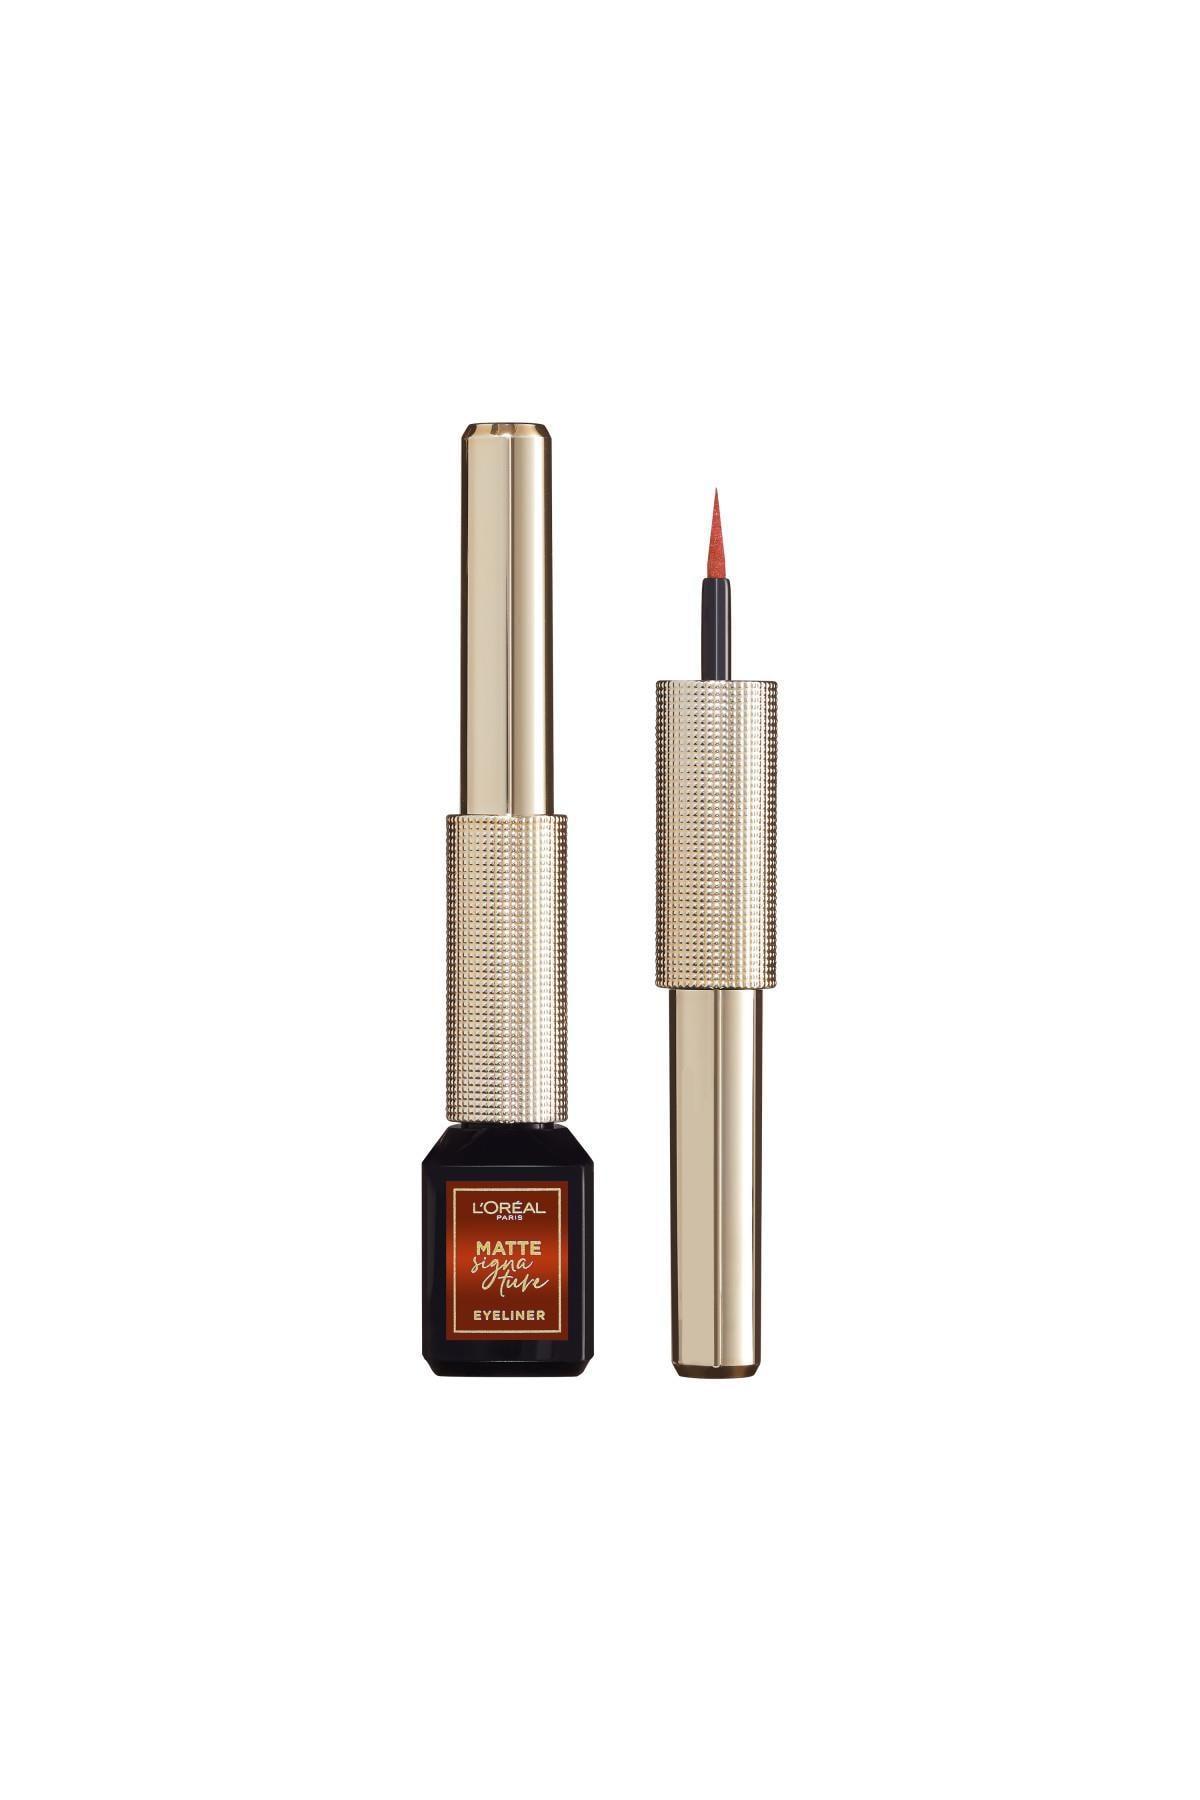 L'Oreal Paris Mat Eyeliner - Matte Signature Eyeliner 07 Copper 30175280 0